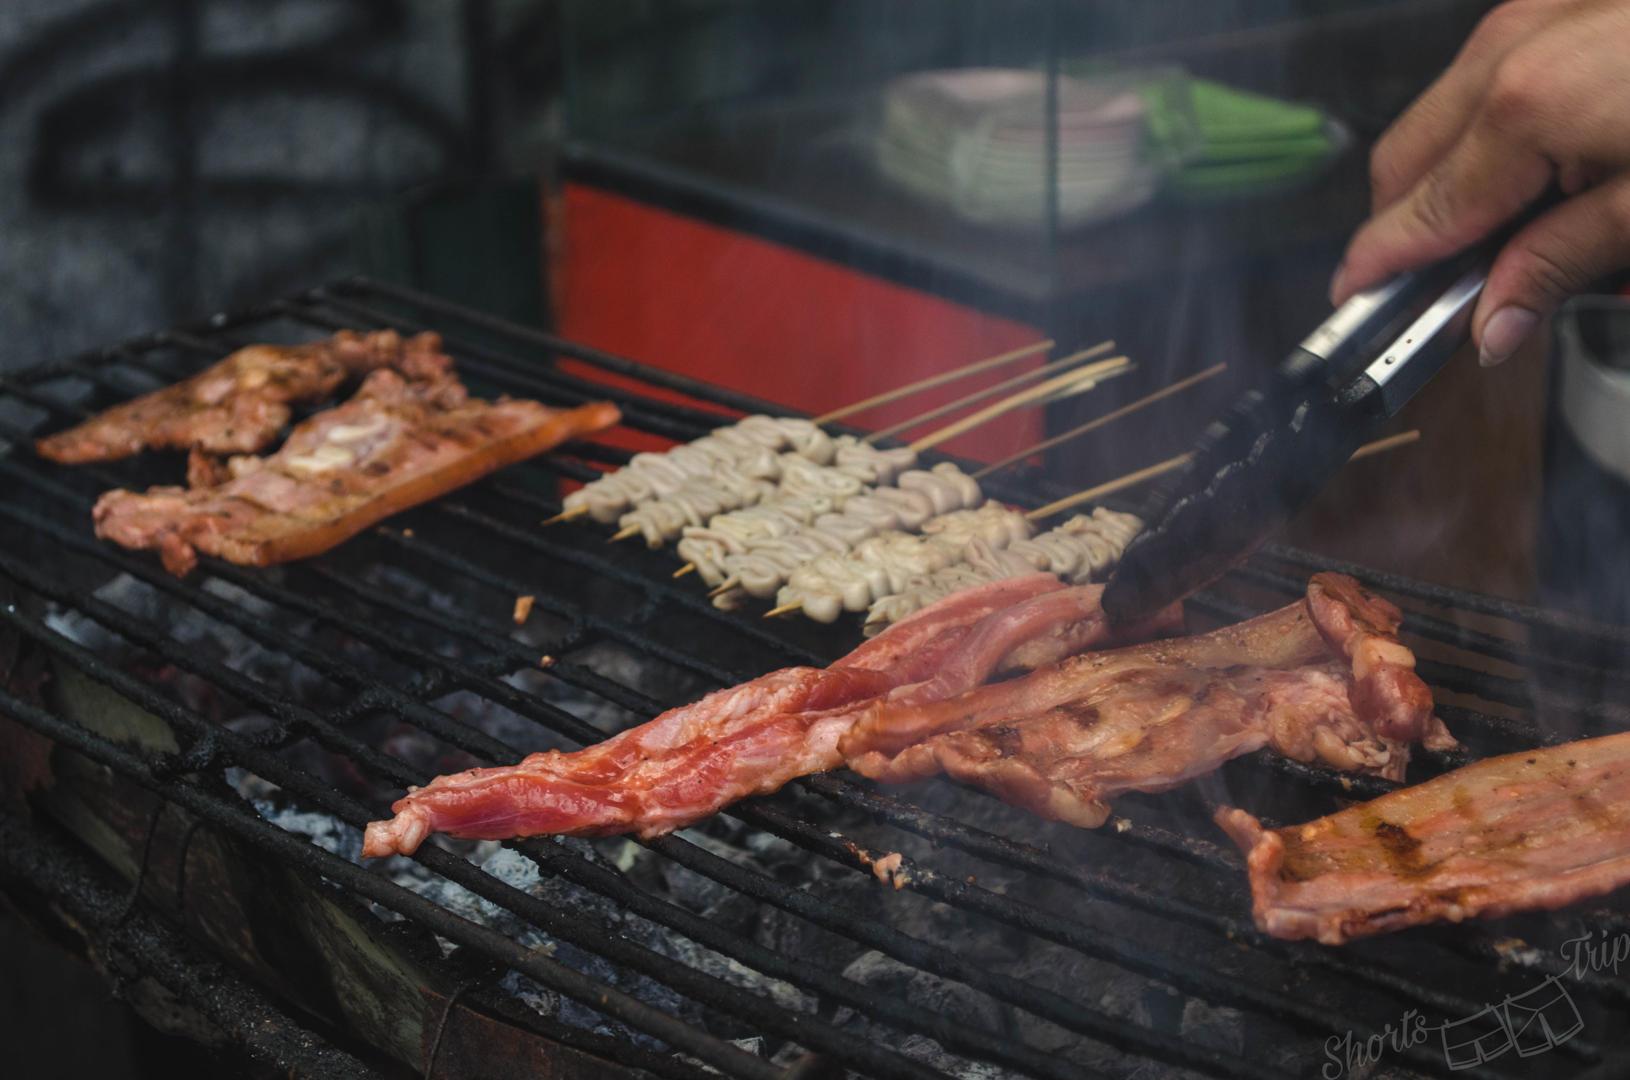 filipino barbeque, street food philippines, cebu street food